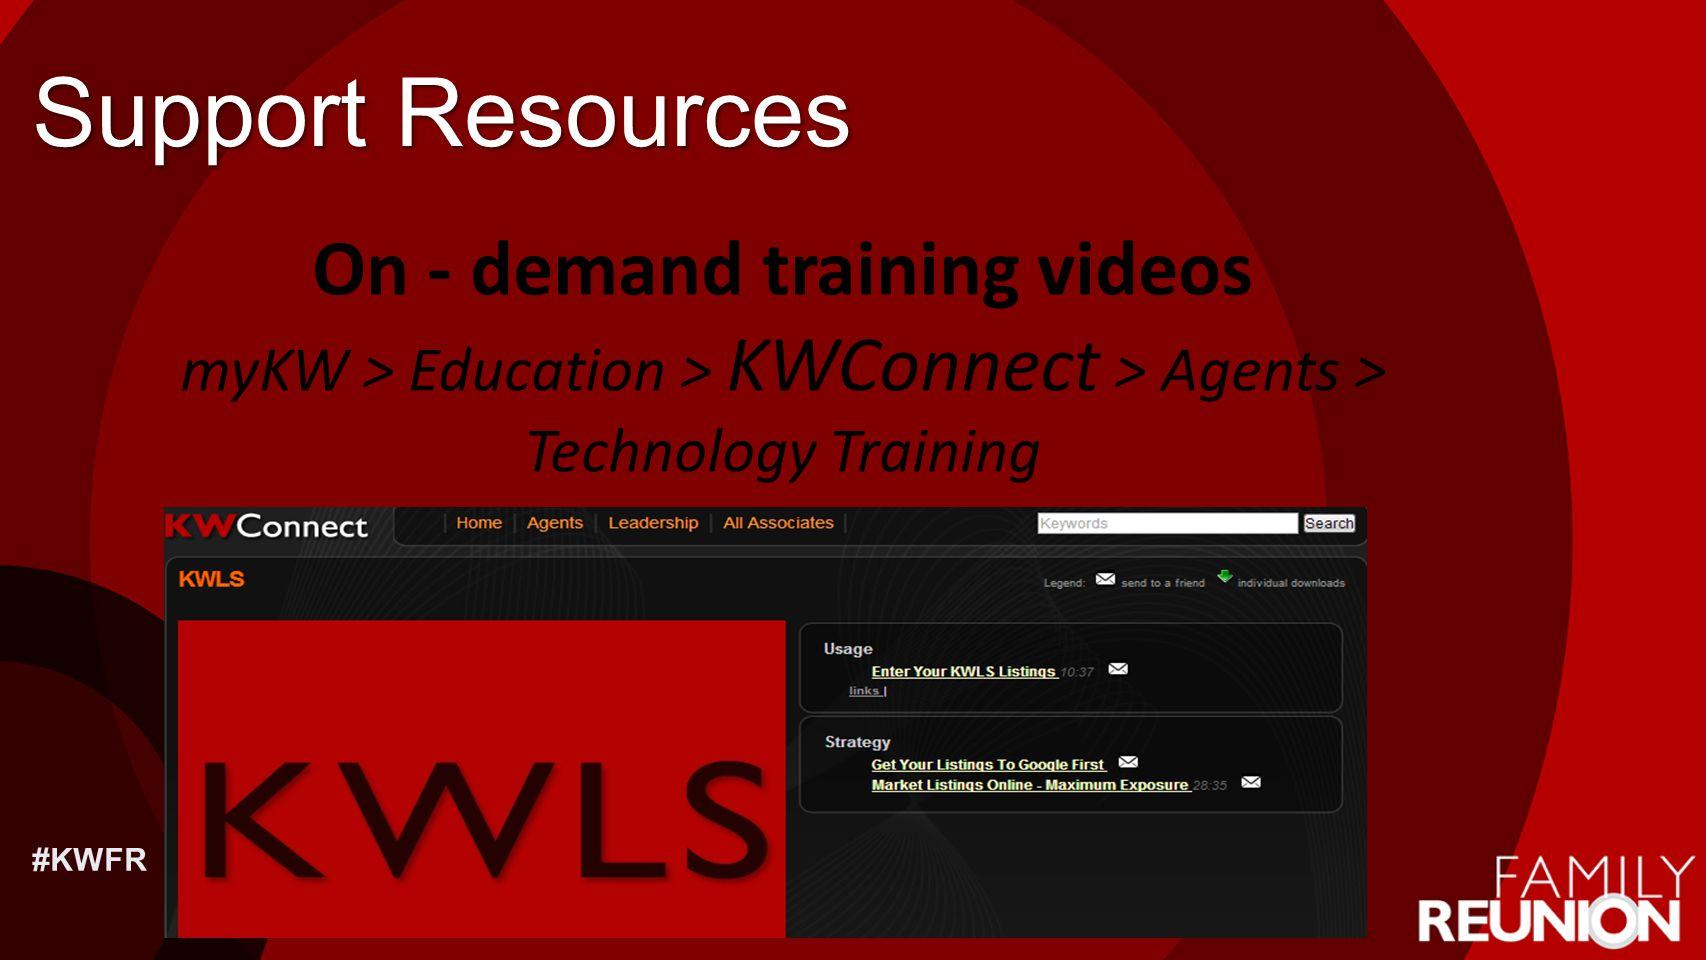 On - demand training videos